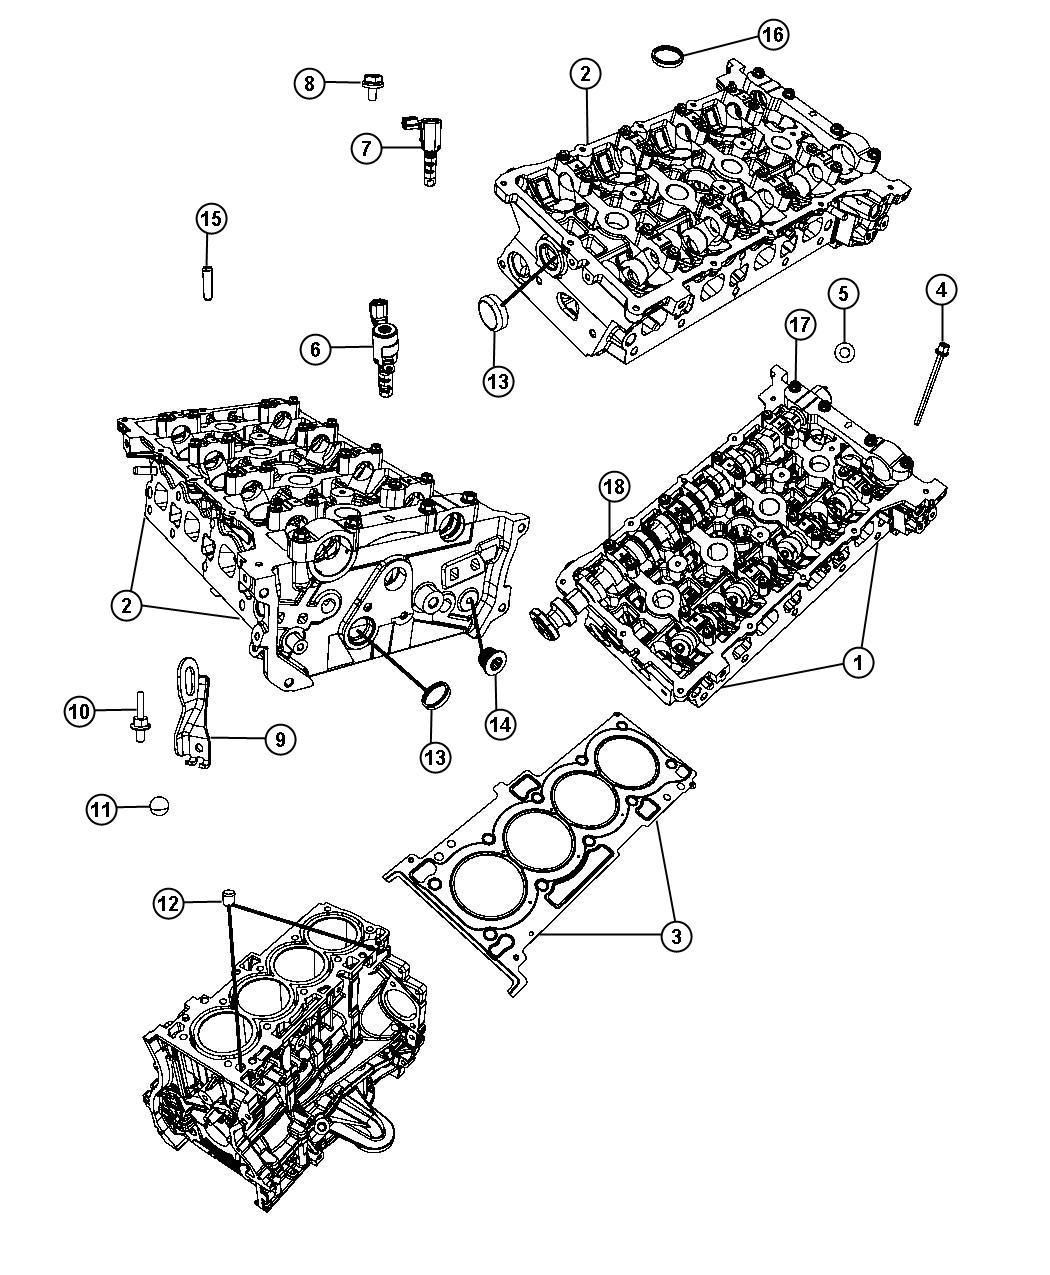 Chrysler Sebring Control Valve Solenoid Oil Intake Variable Valve Timing